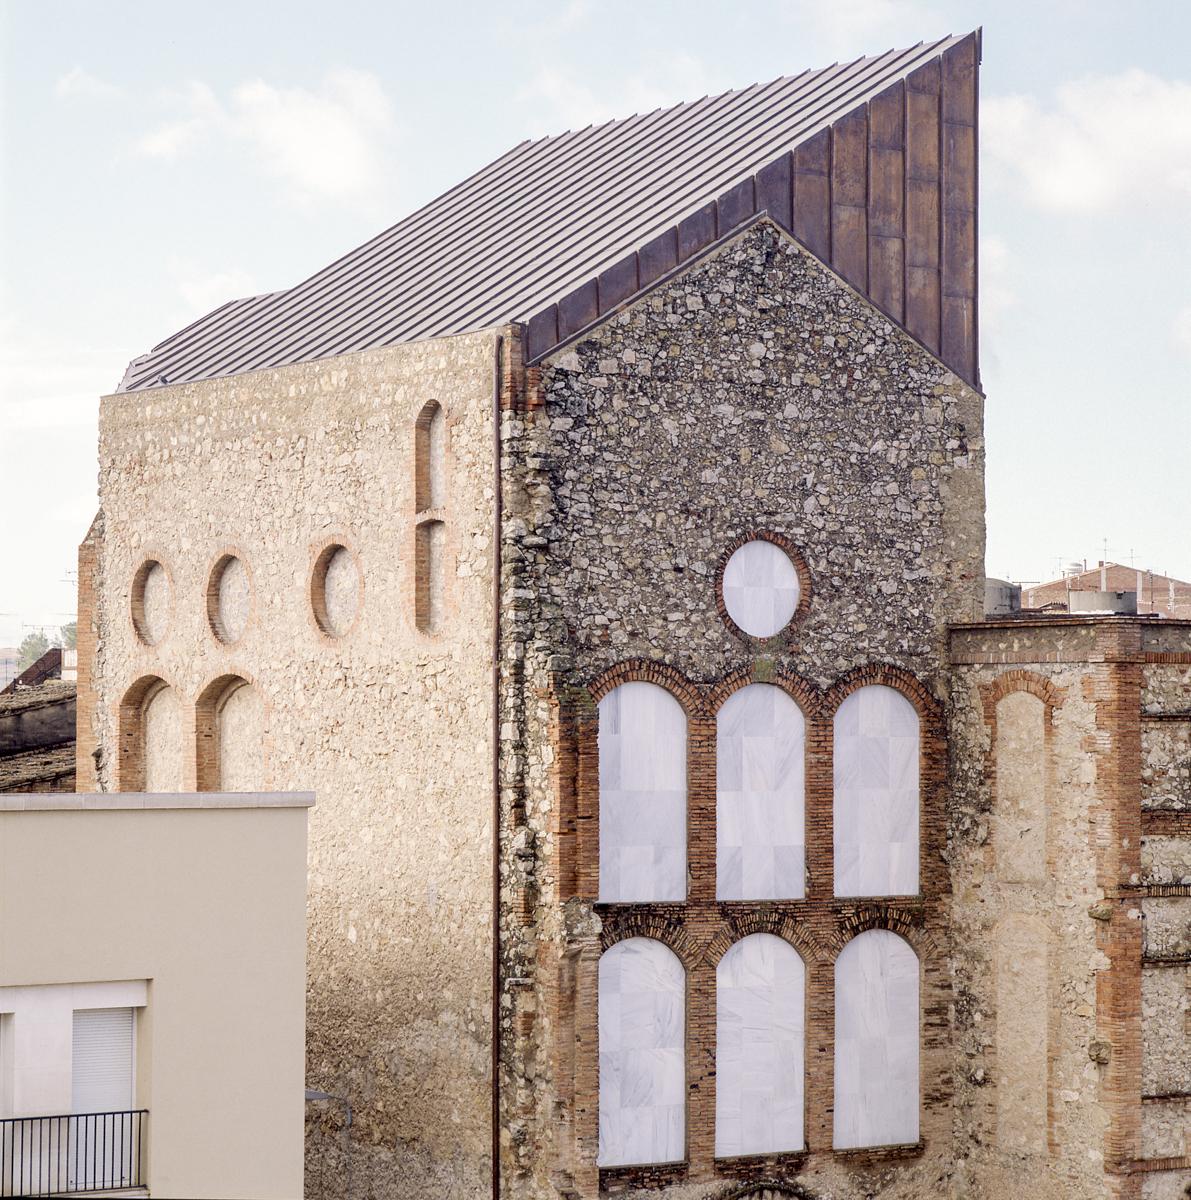 Escuela de pintura mural en Sant Sadurní - Garcés - de Seta - Bonet